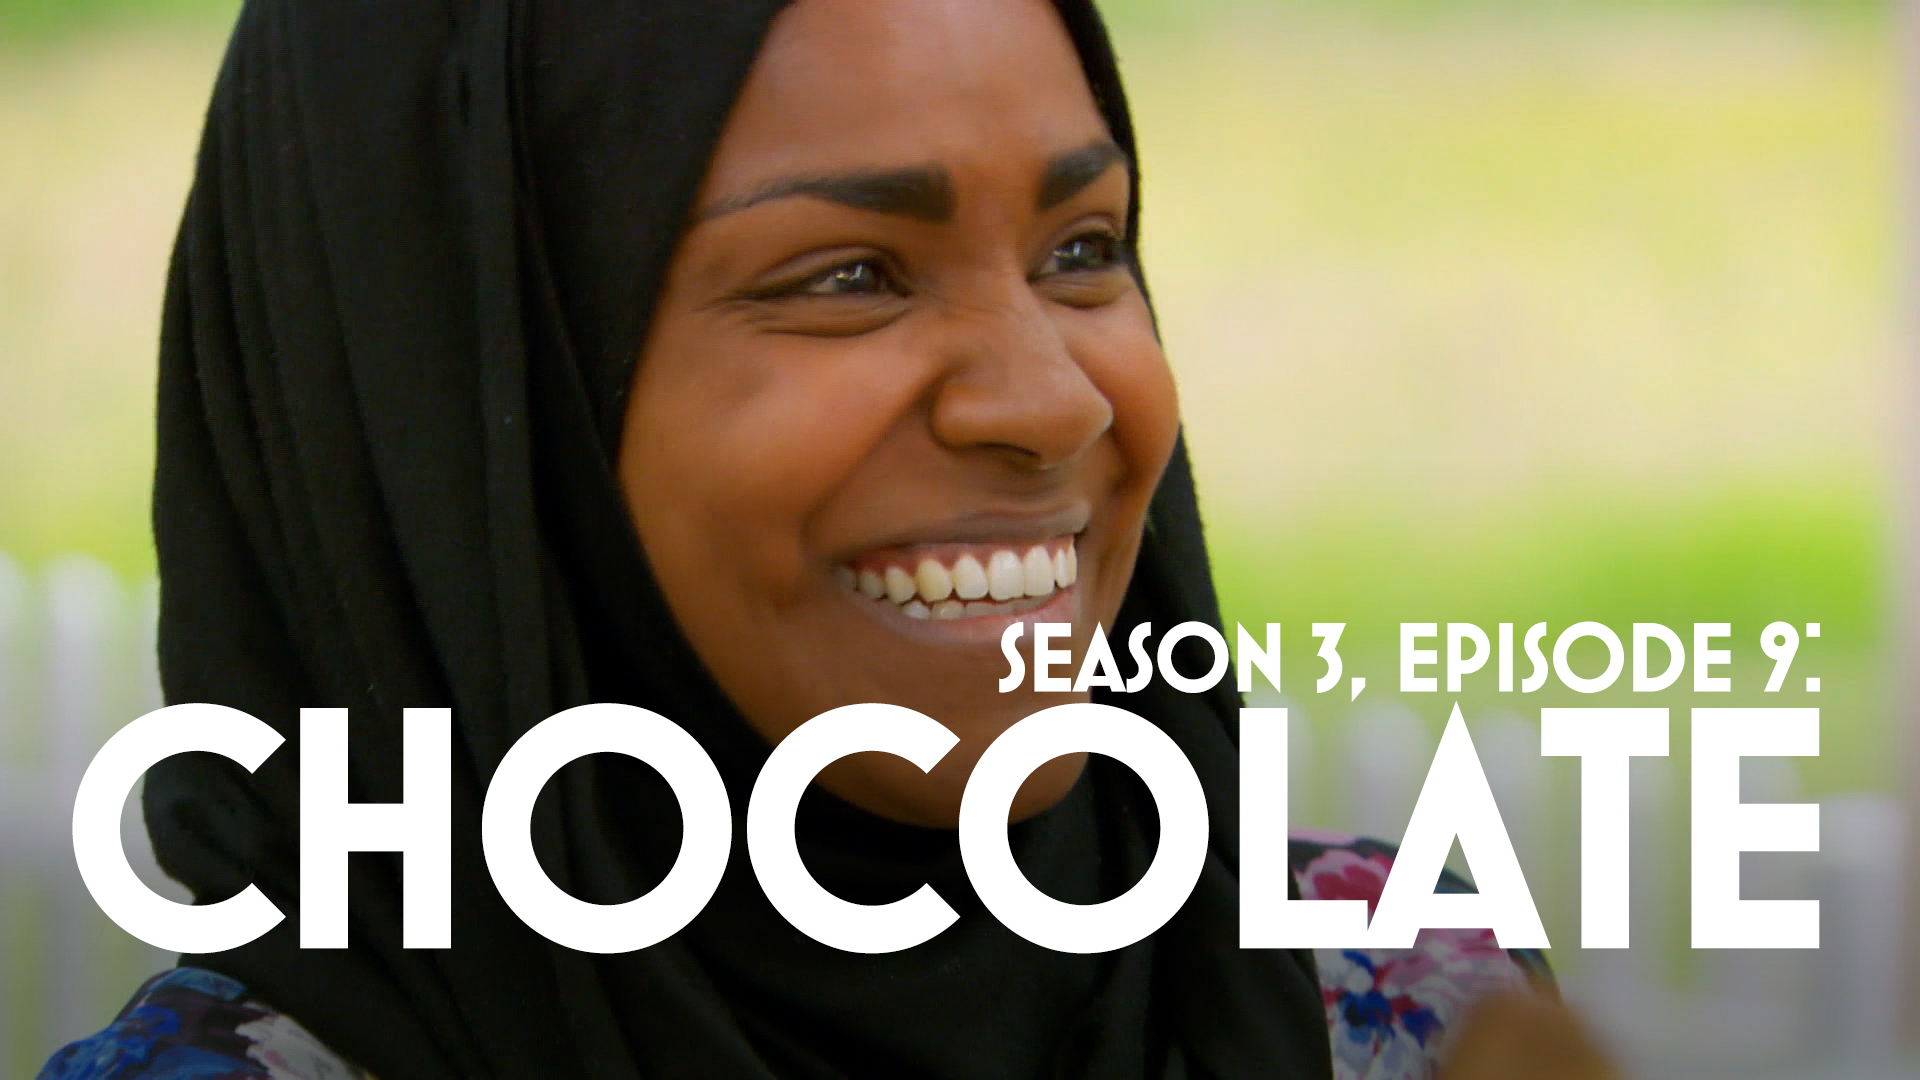 Episode 9: Chocolate